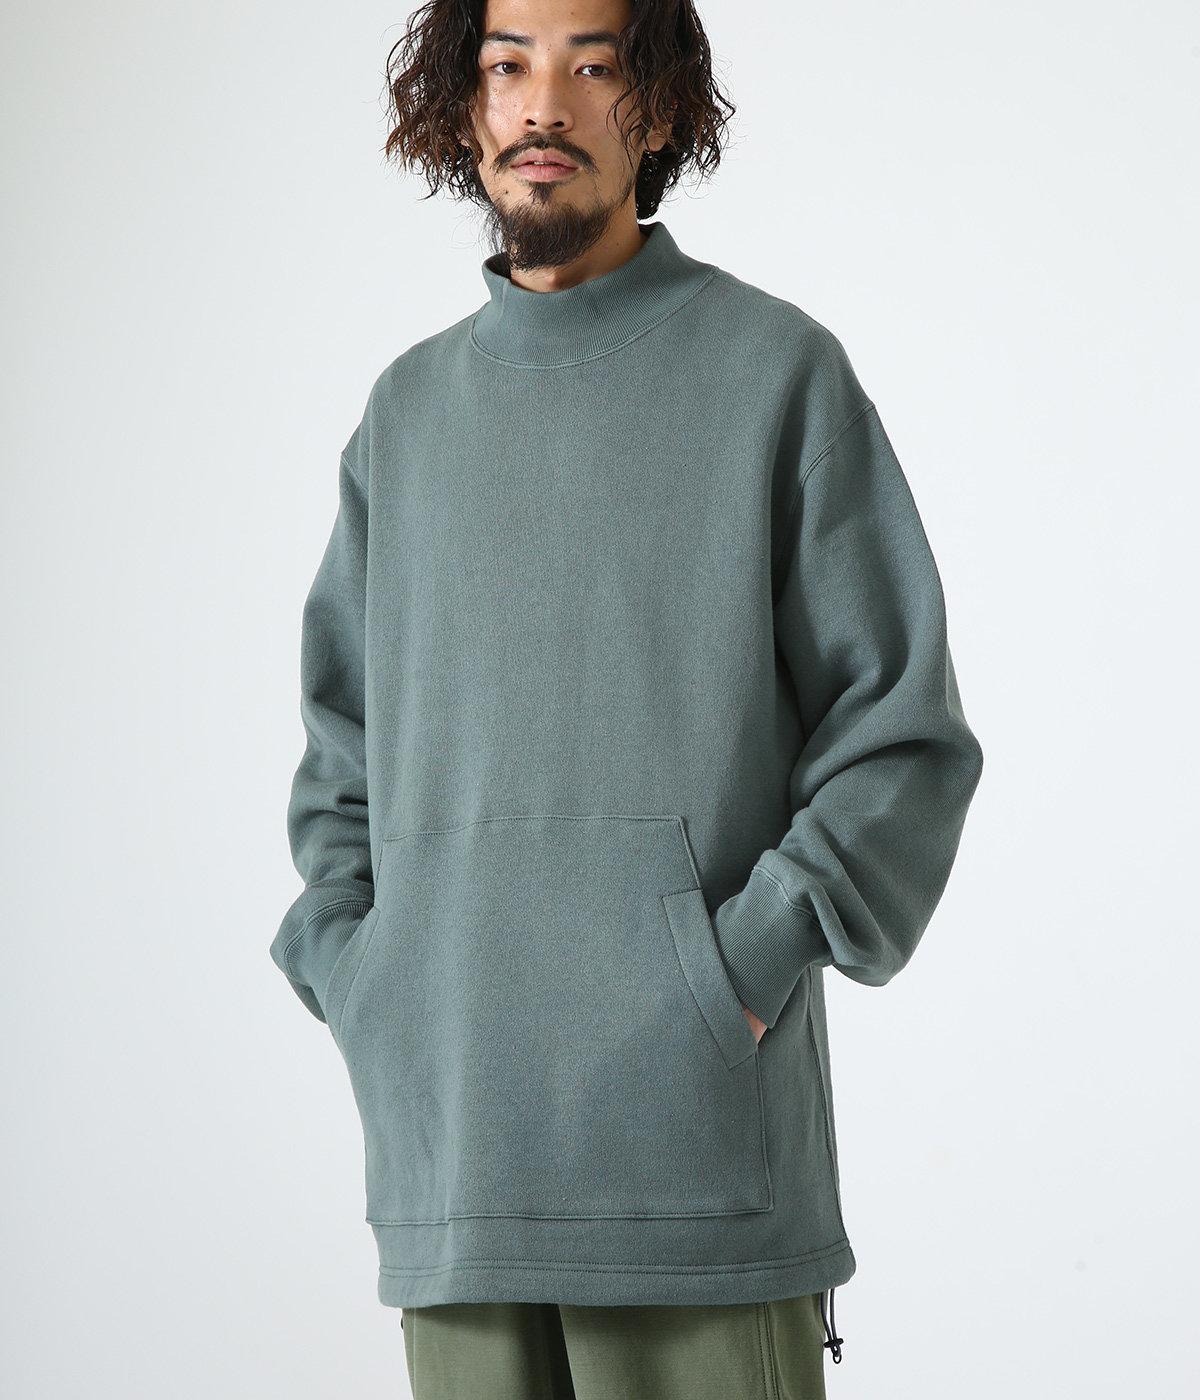 MOCK NECK - organic cotton fleece -